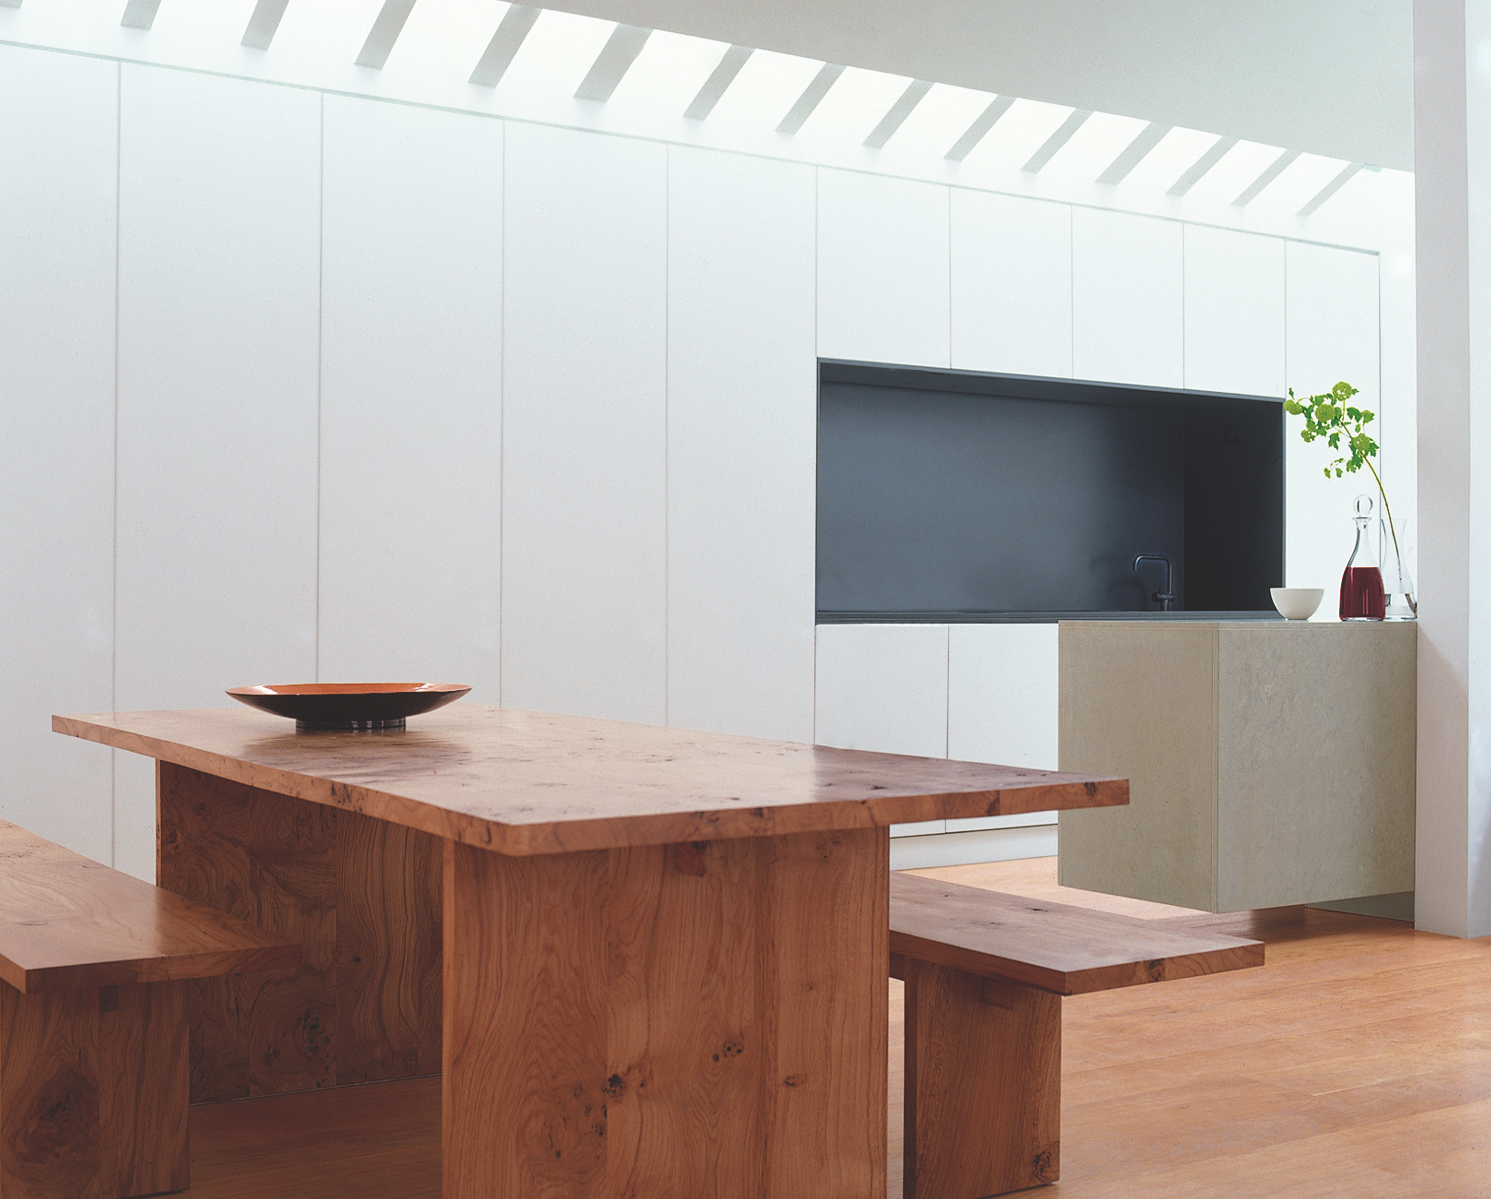 Mayfair Mews House, London. Dining room towards the kitchen. Gavin Jackson Architects.